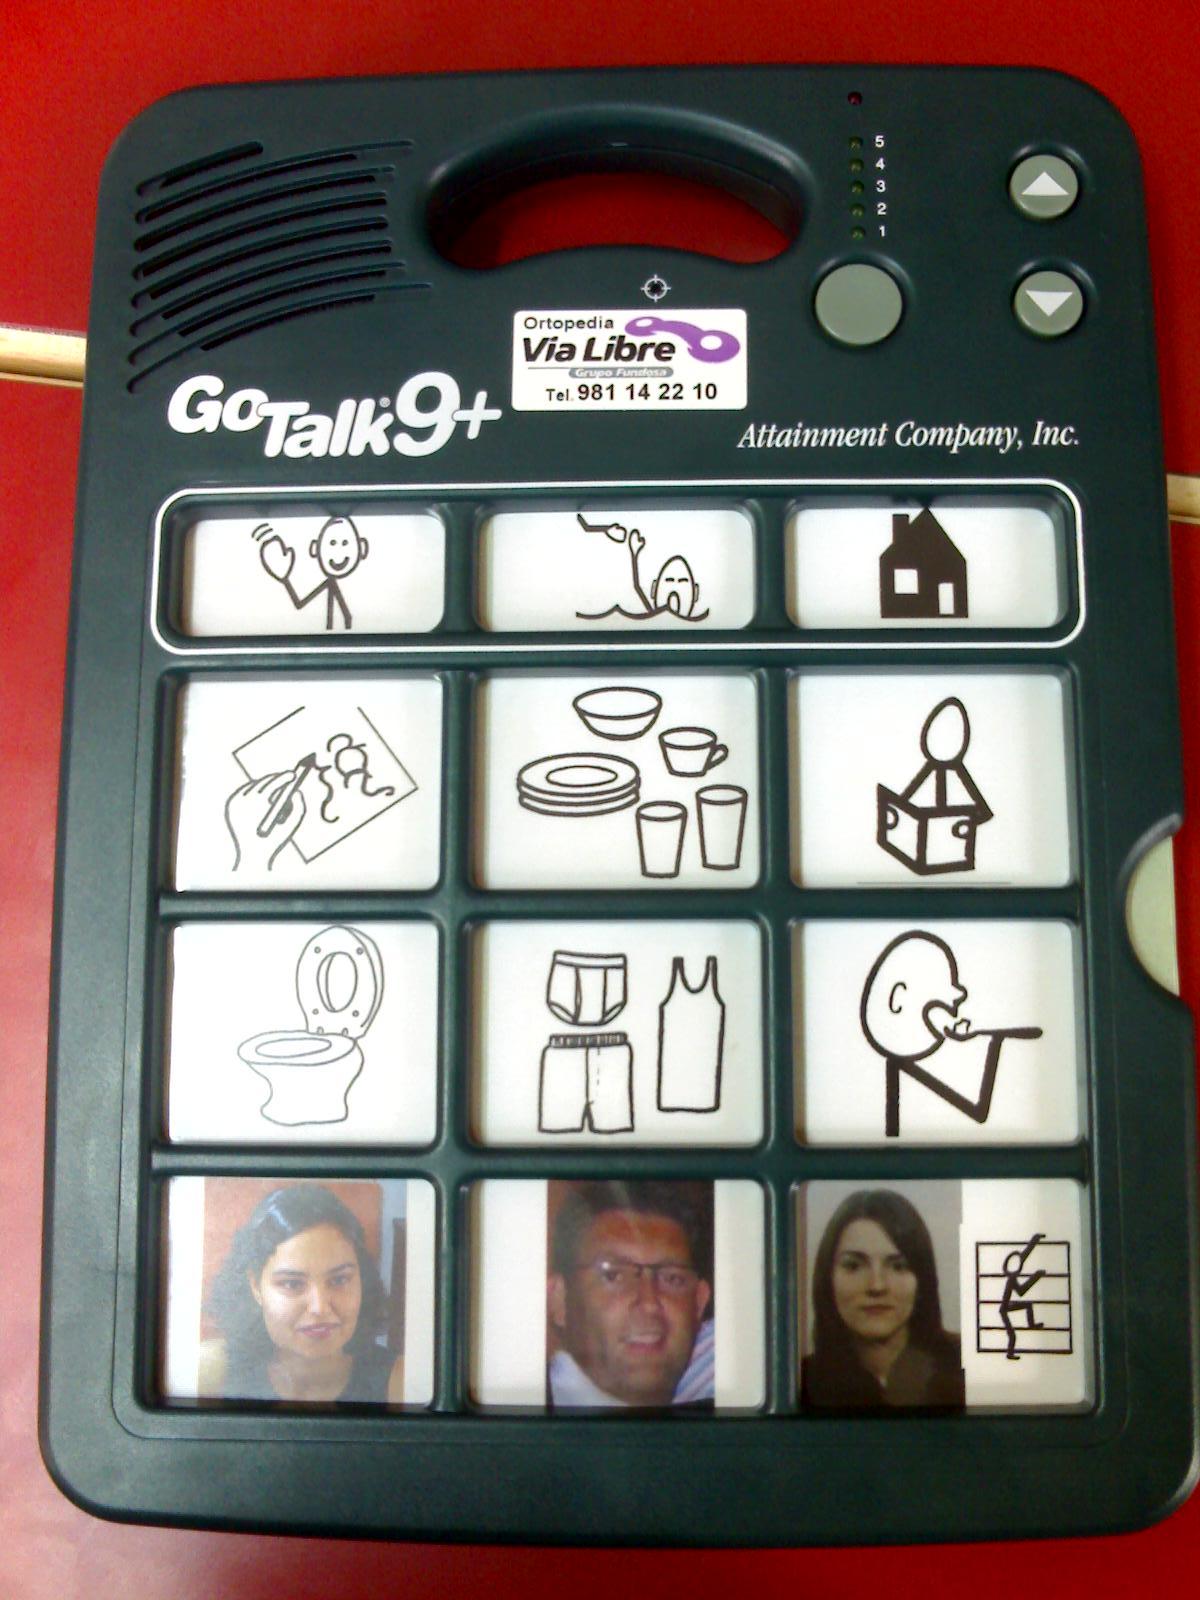 1ª Imaxe do obradoiro 'GoTalk'